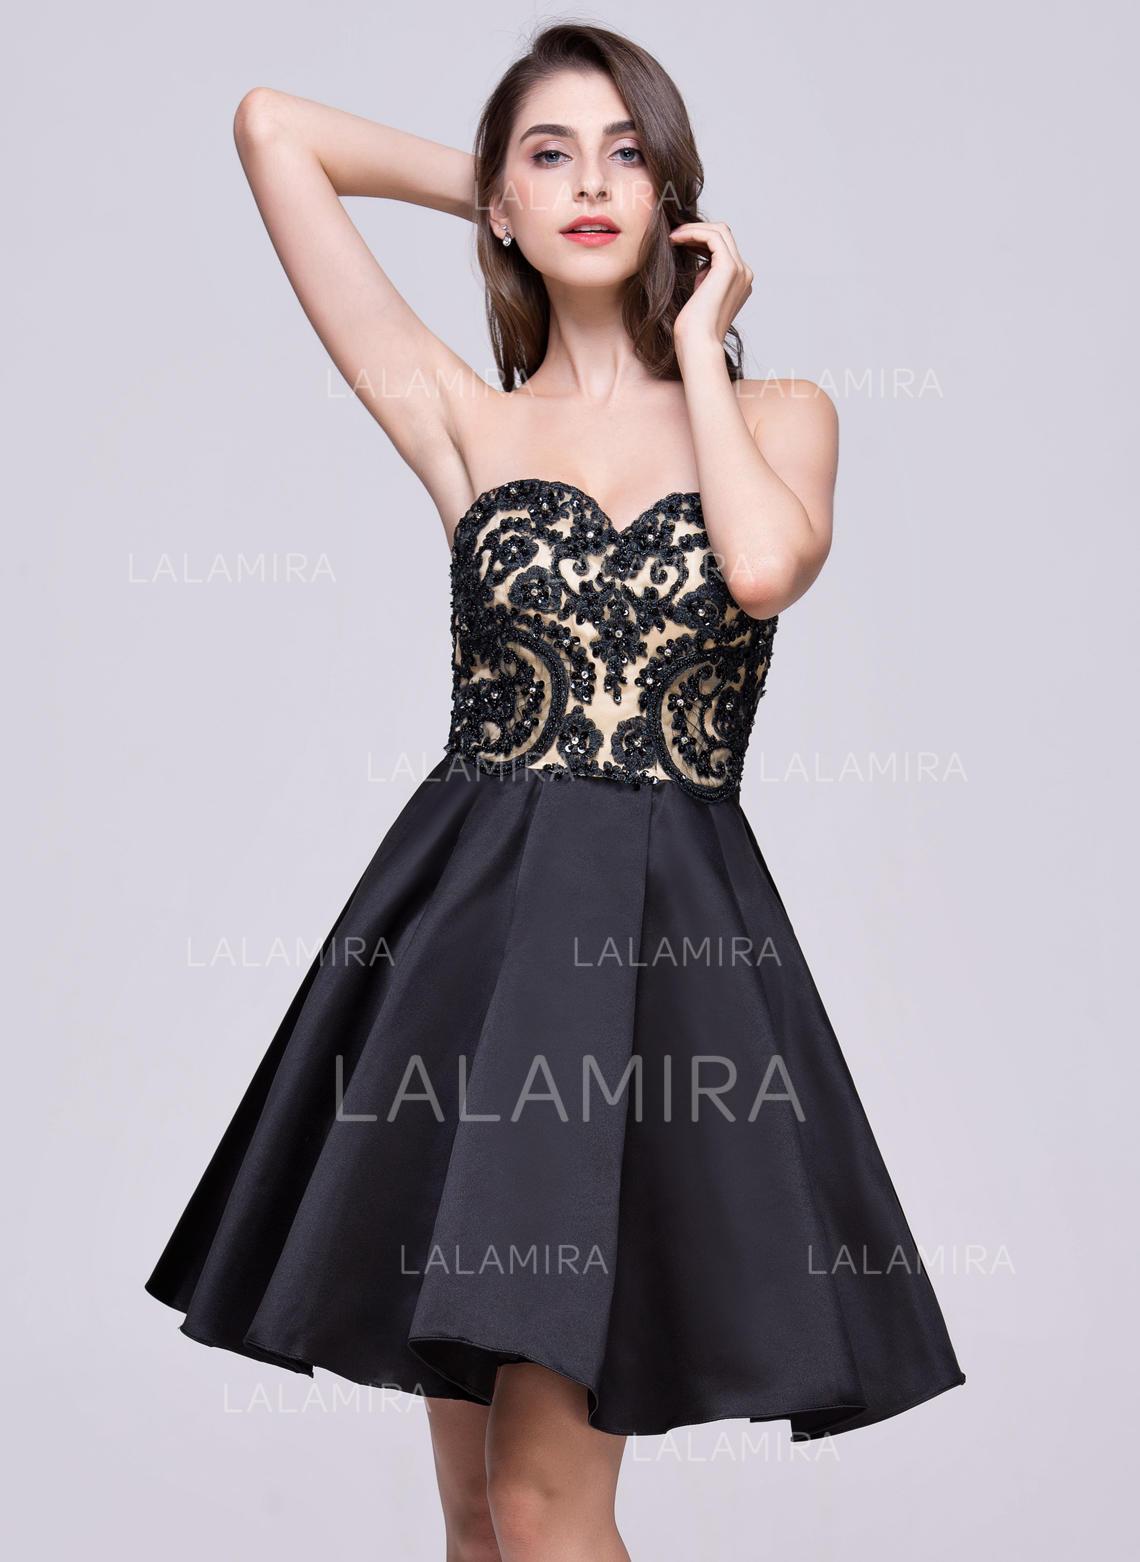 d257f7ac326 Delicate Satin Lace Homecoming Dresses A-Line Princess Short Mini Sweetheart  Sleeveless (. Loading zoom